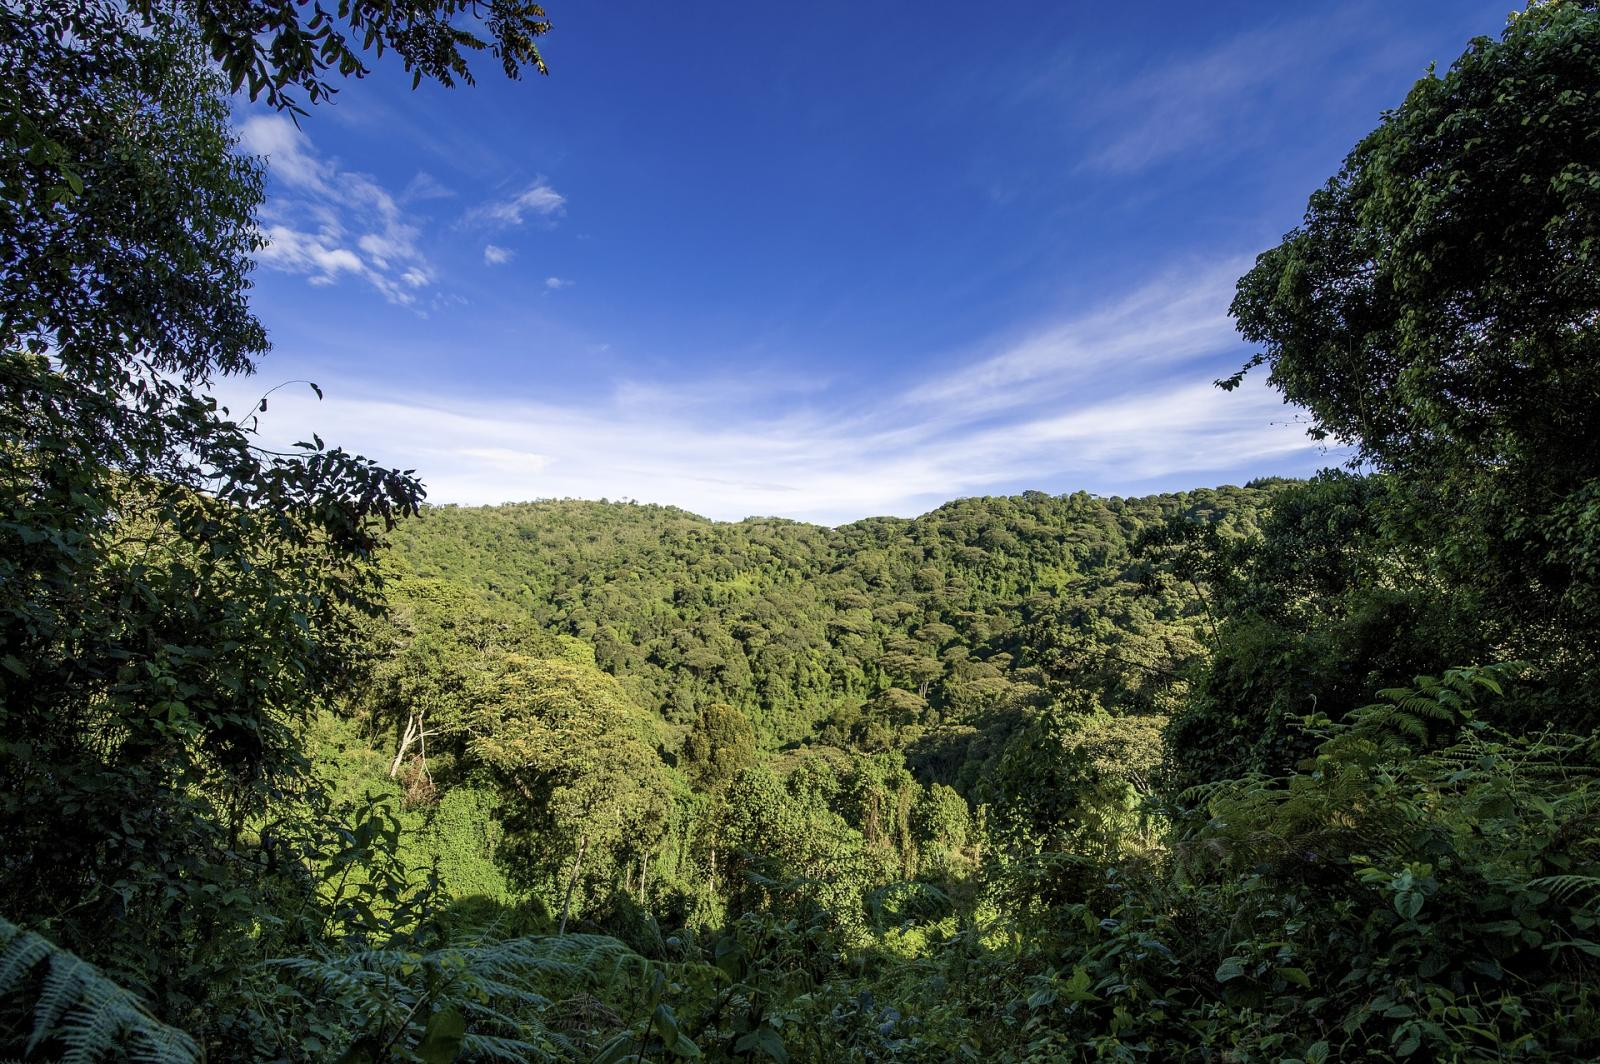 Ugandan jungle. Photo credit: Pixabay